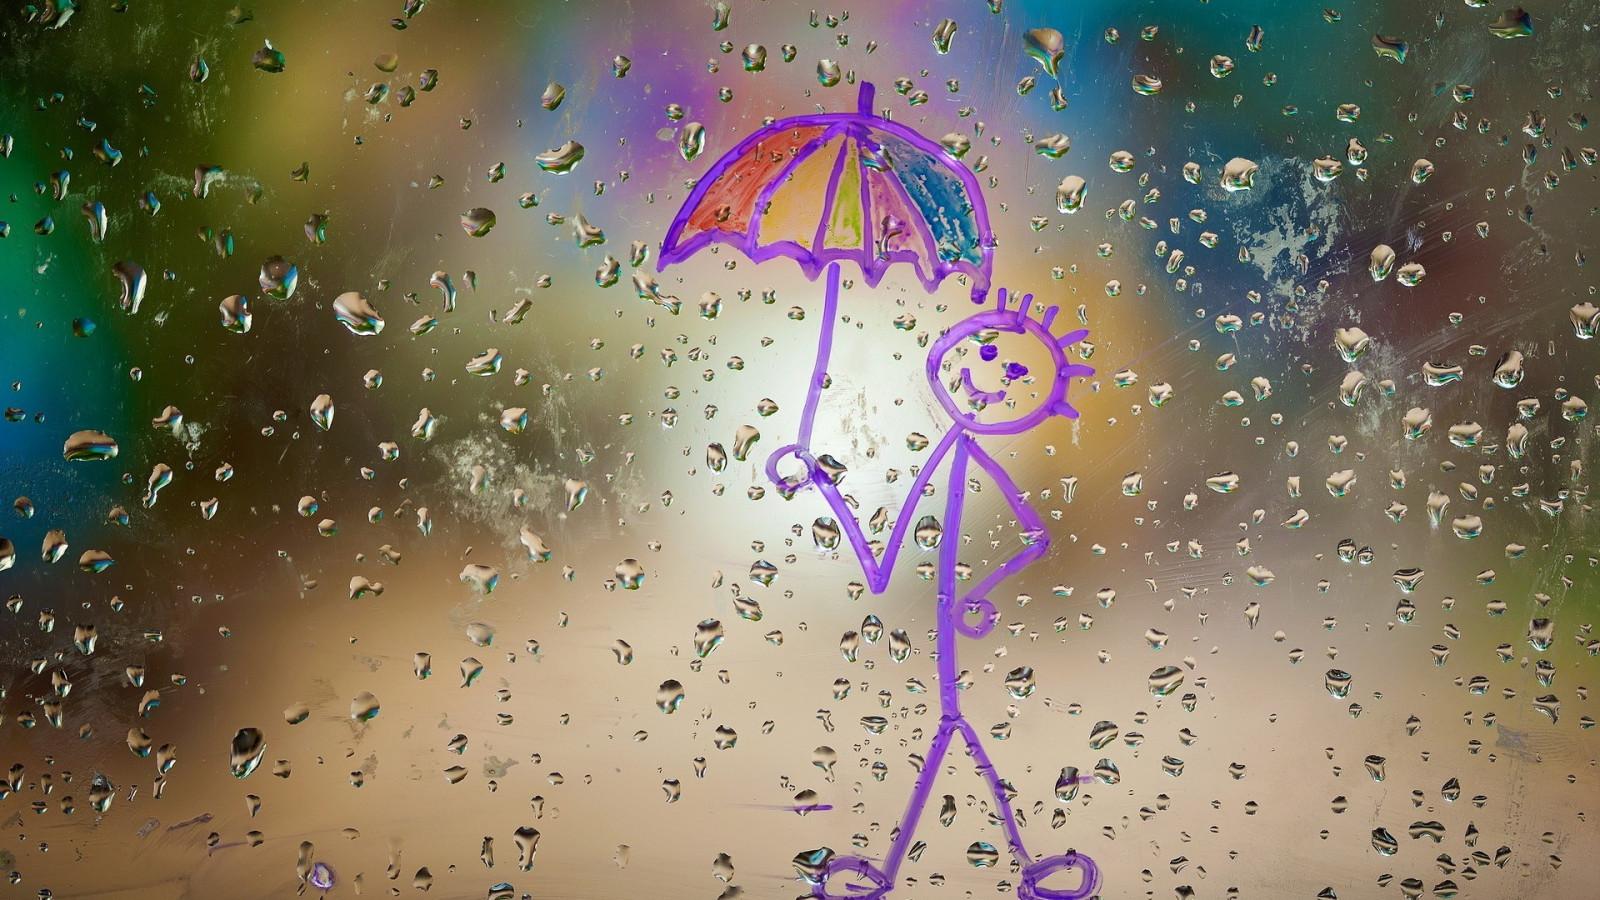 Картинки про дождь с надписью, картинки язь юбилей